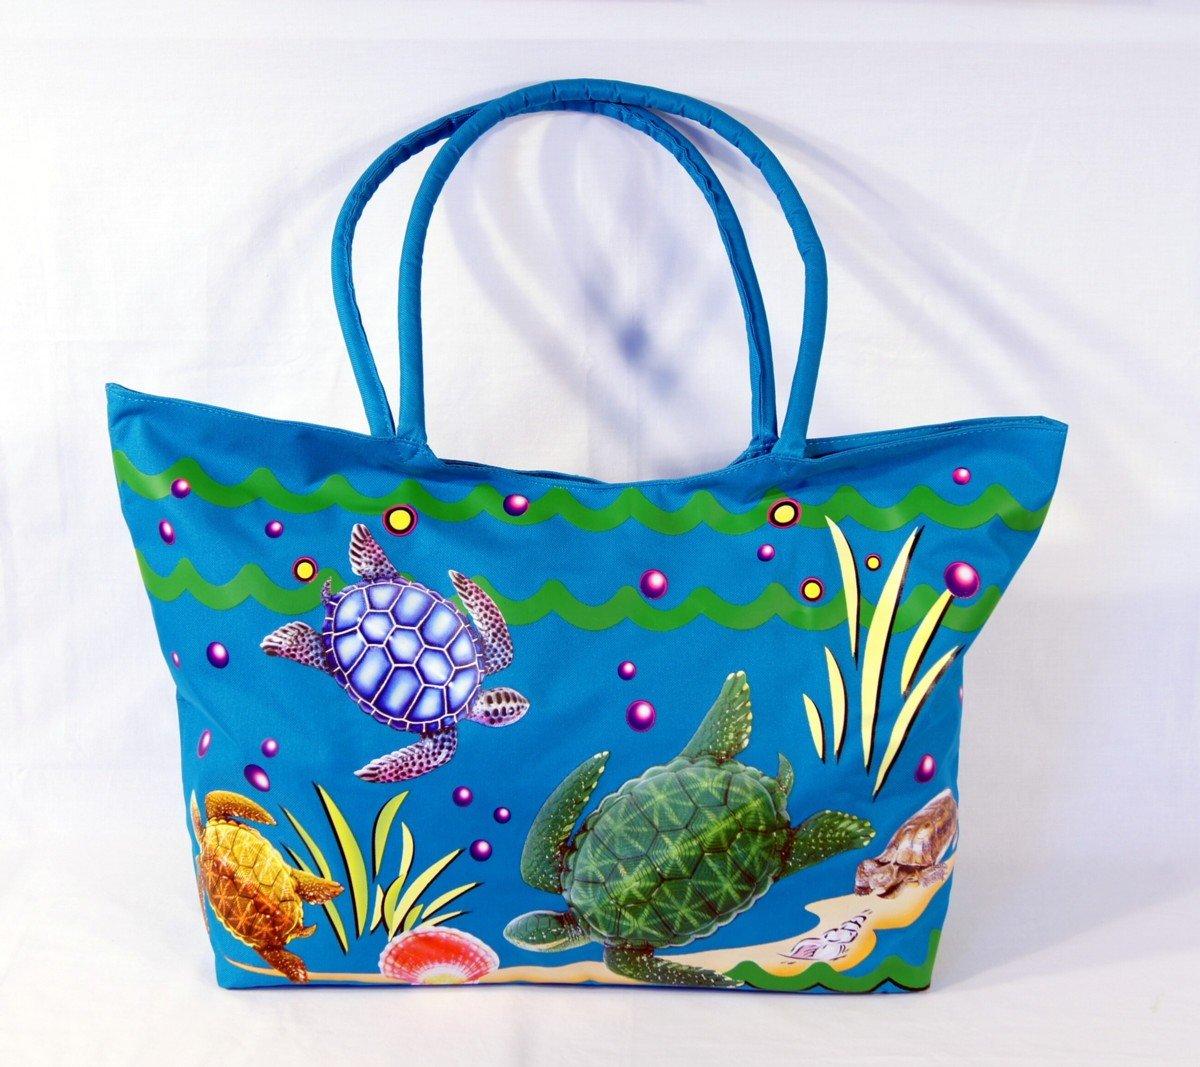 Beach Bag Waterproof Beach Bags With Pockets